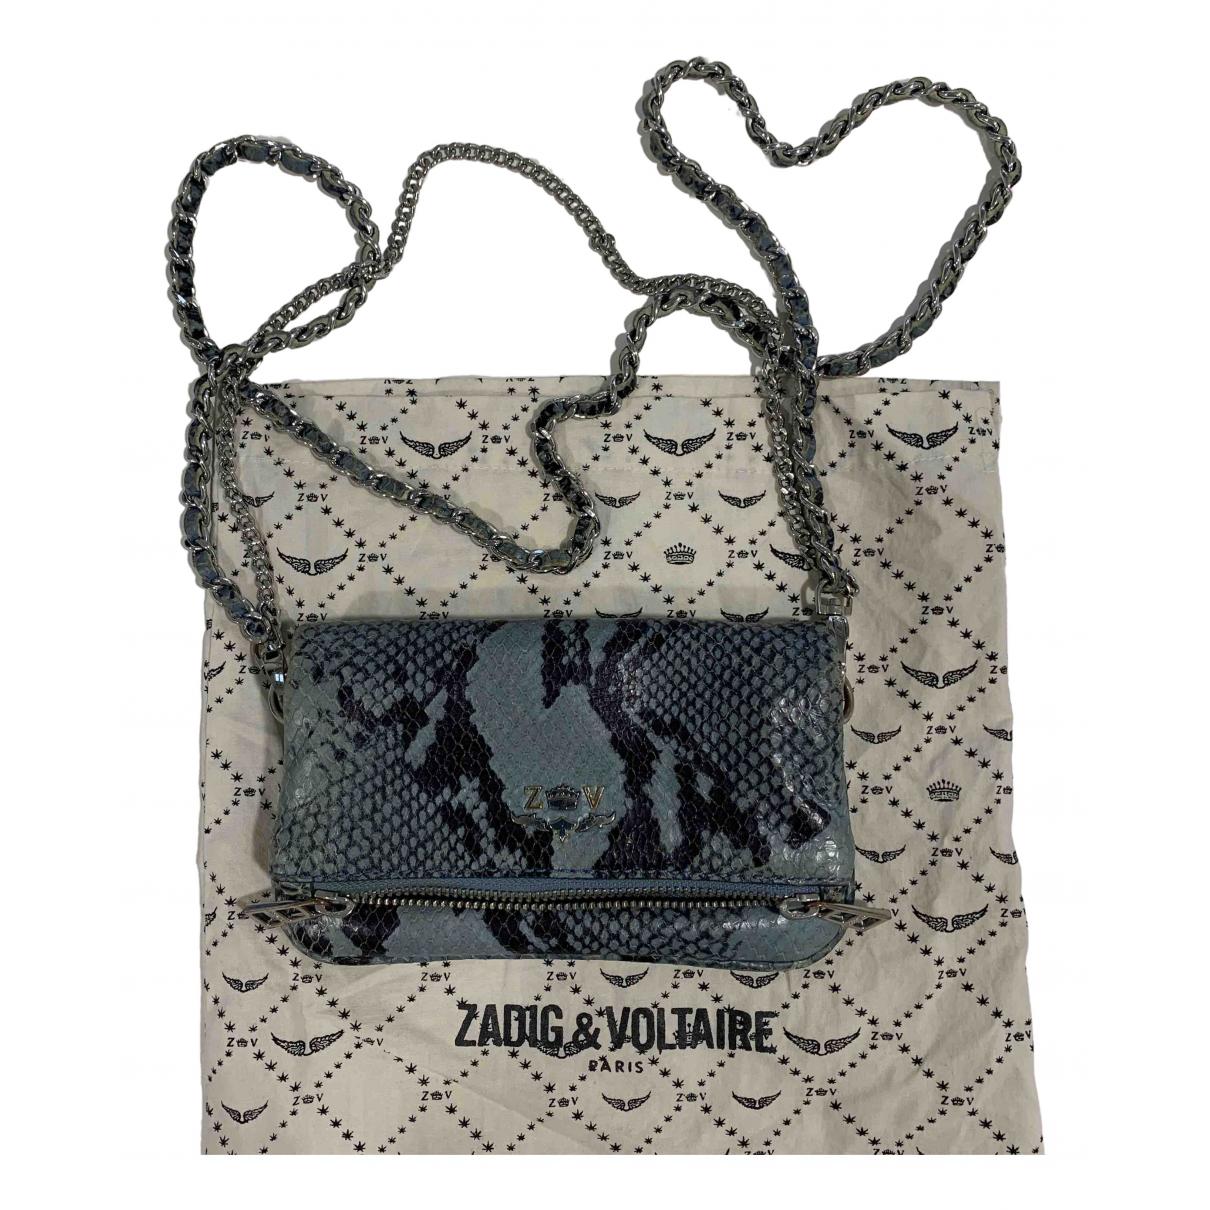 Zadig & Voltaire Rock Black Leather handbag for Women N